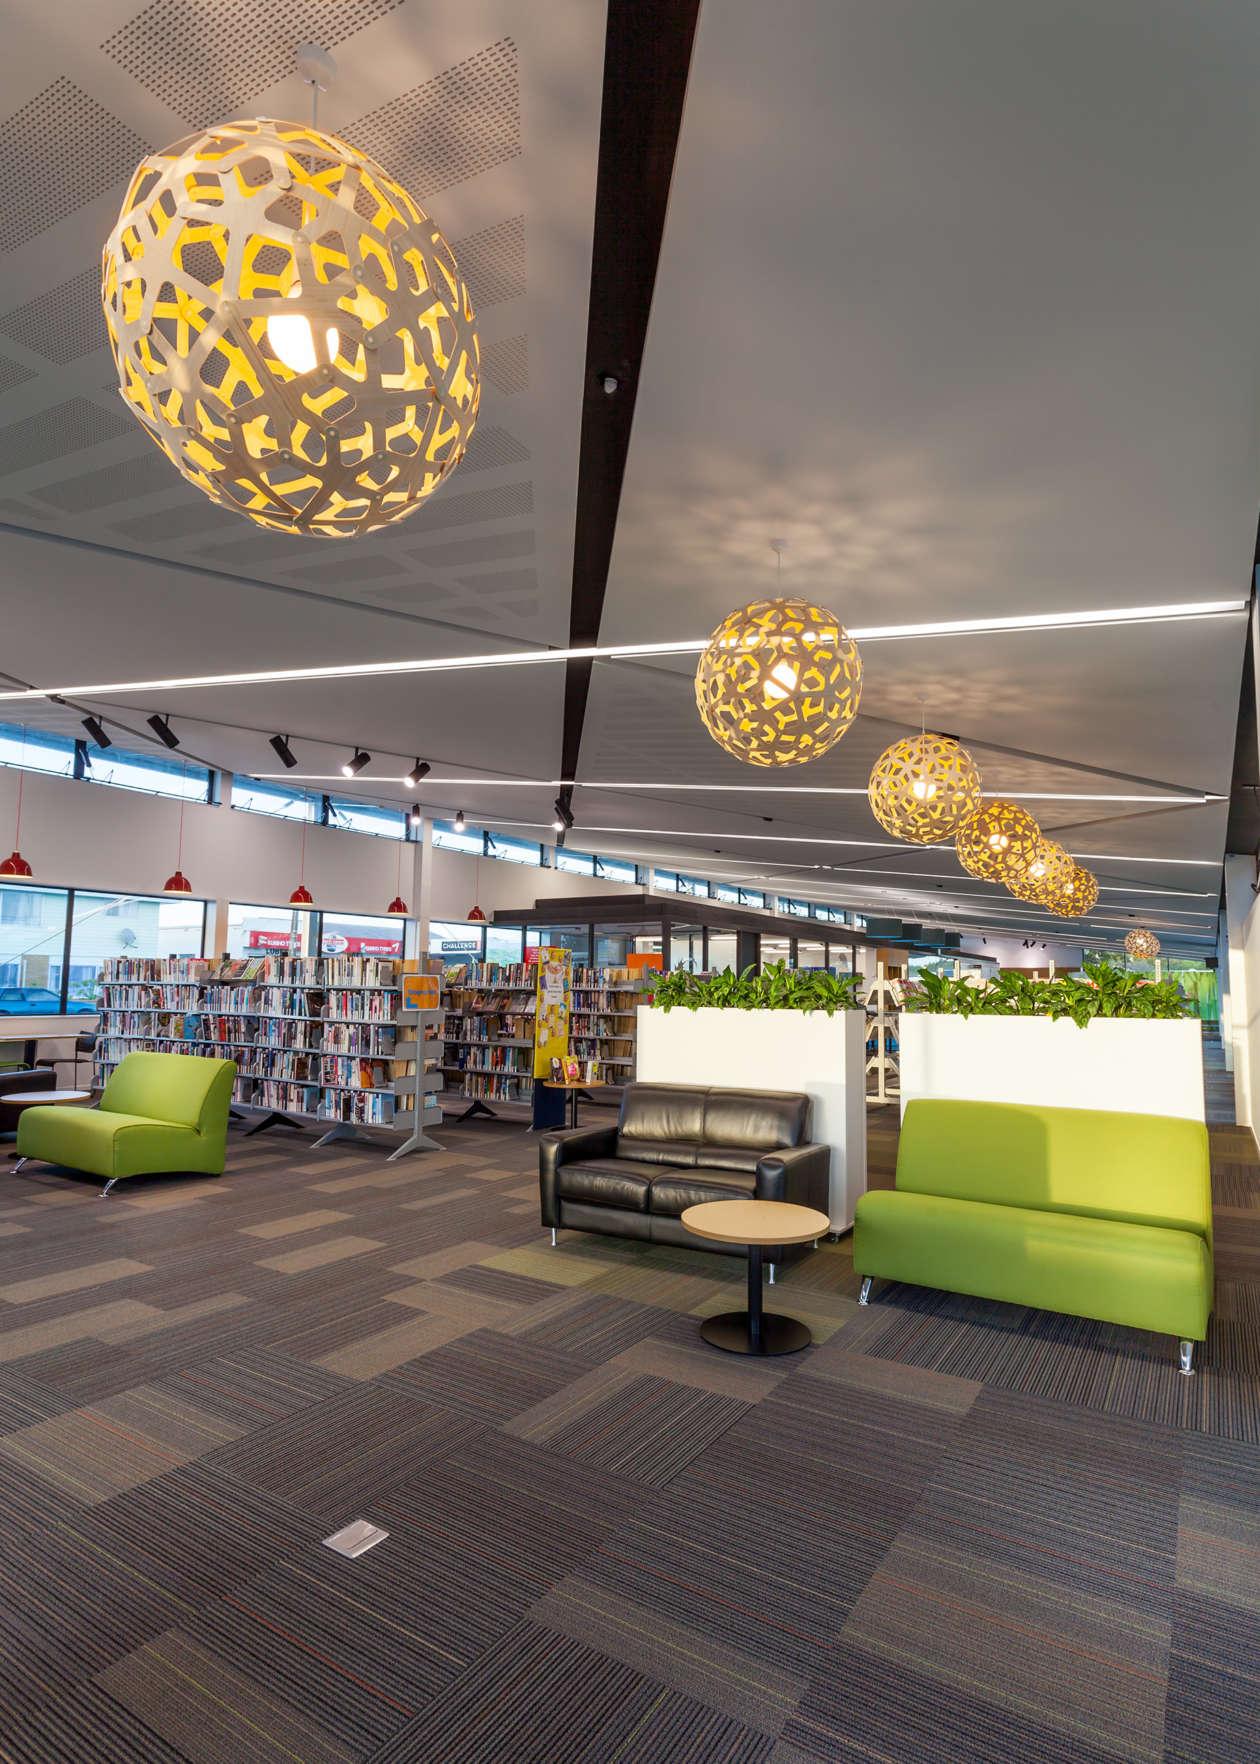 Lincoln Library23 04 2015 O